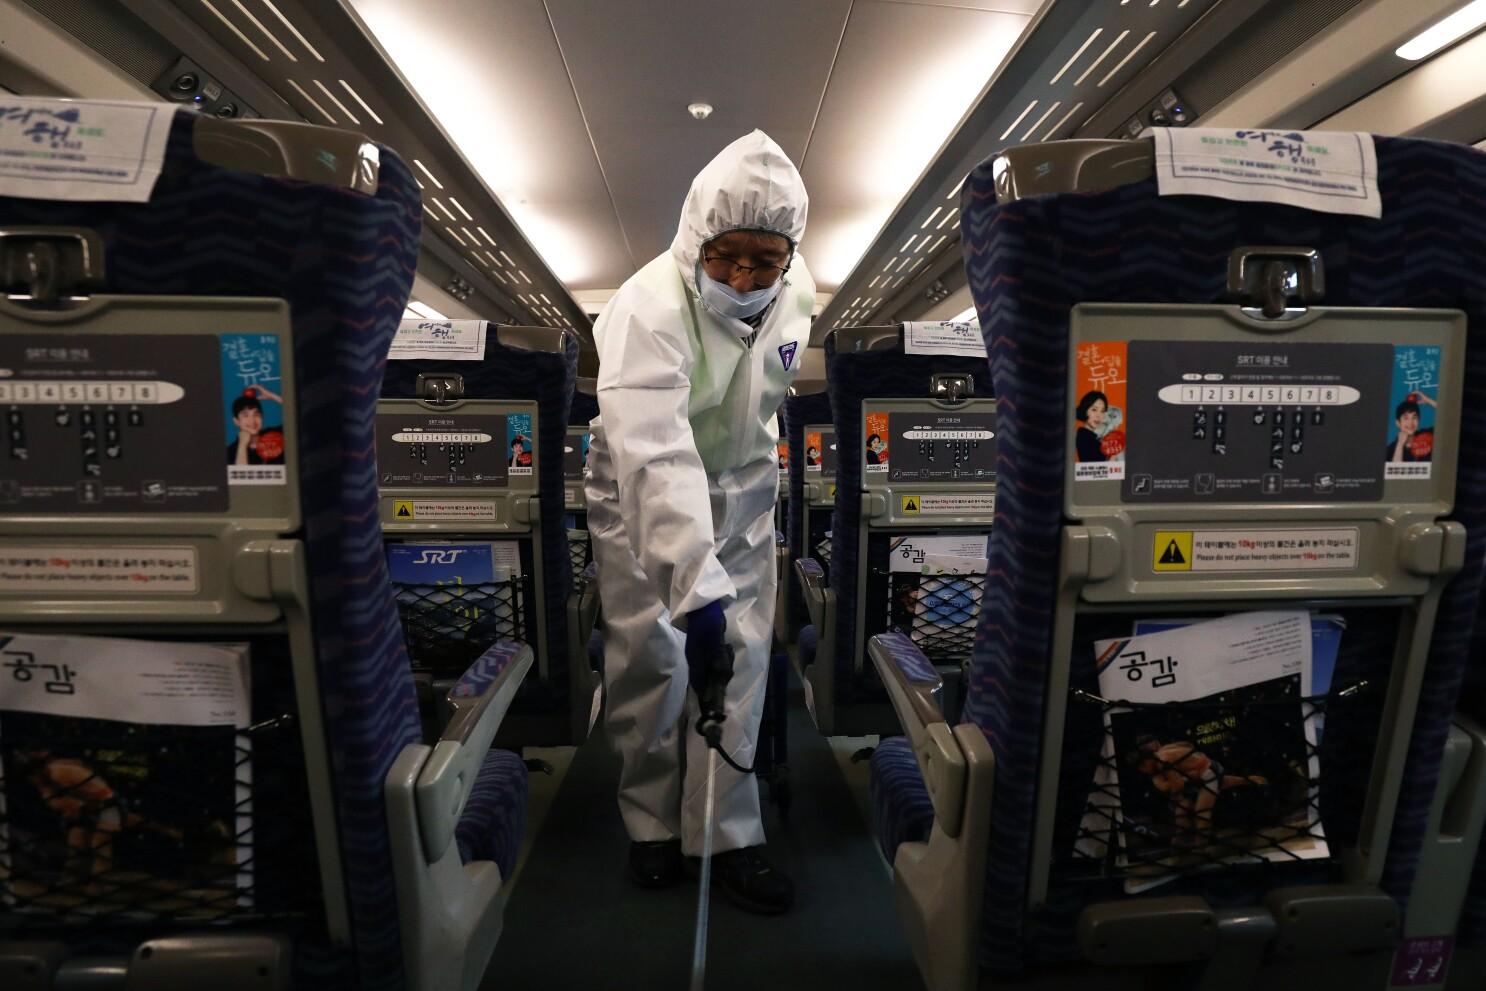 Researchers Developing Coronavirus Detection System to Screen Travelers